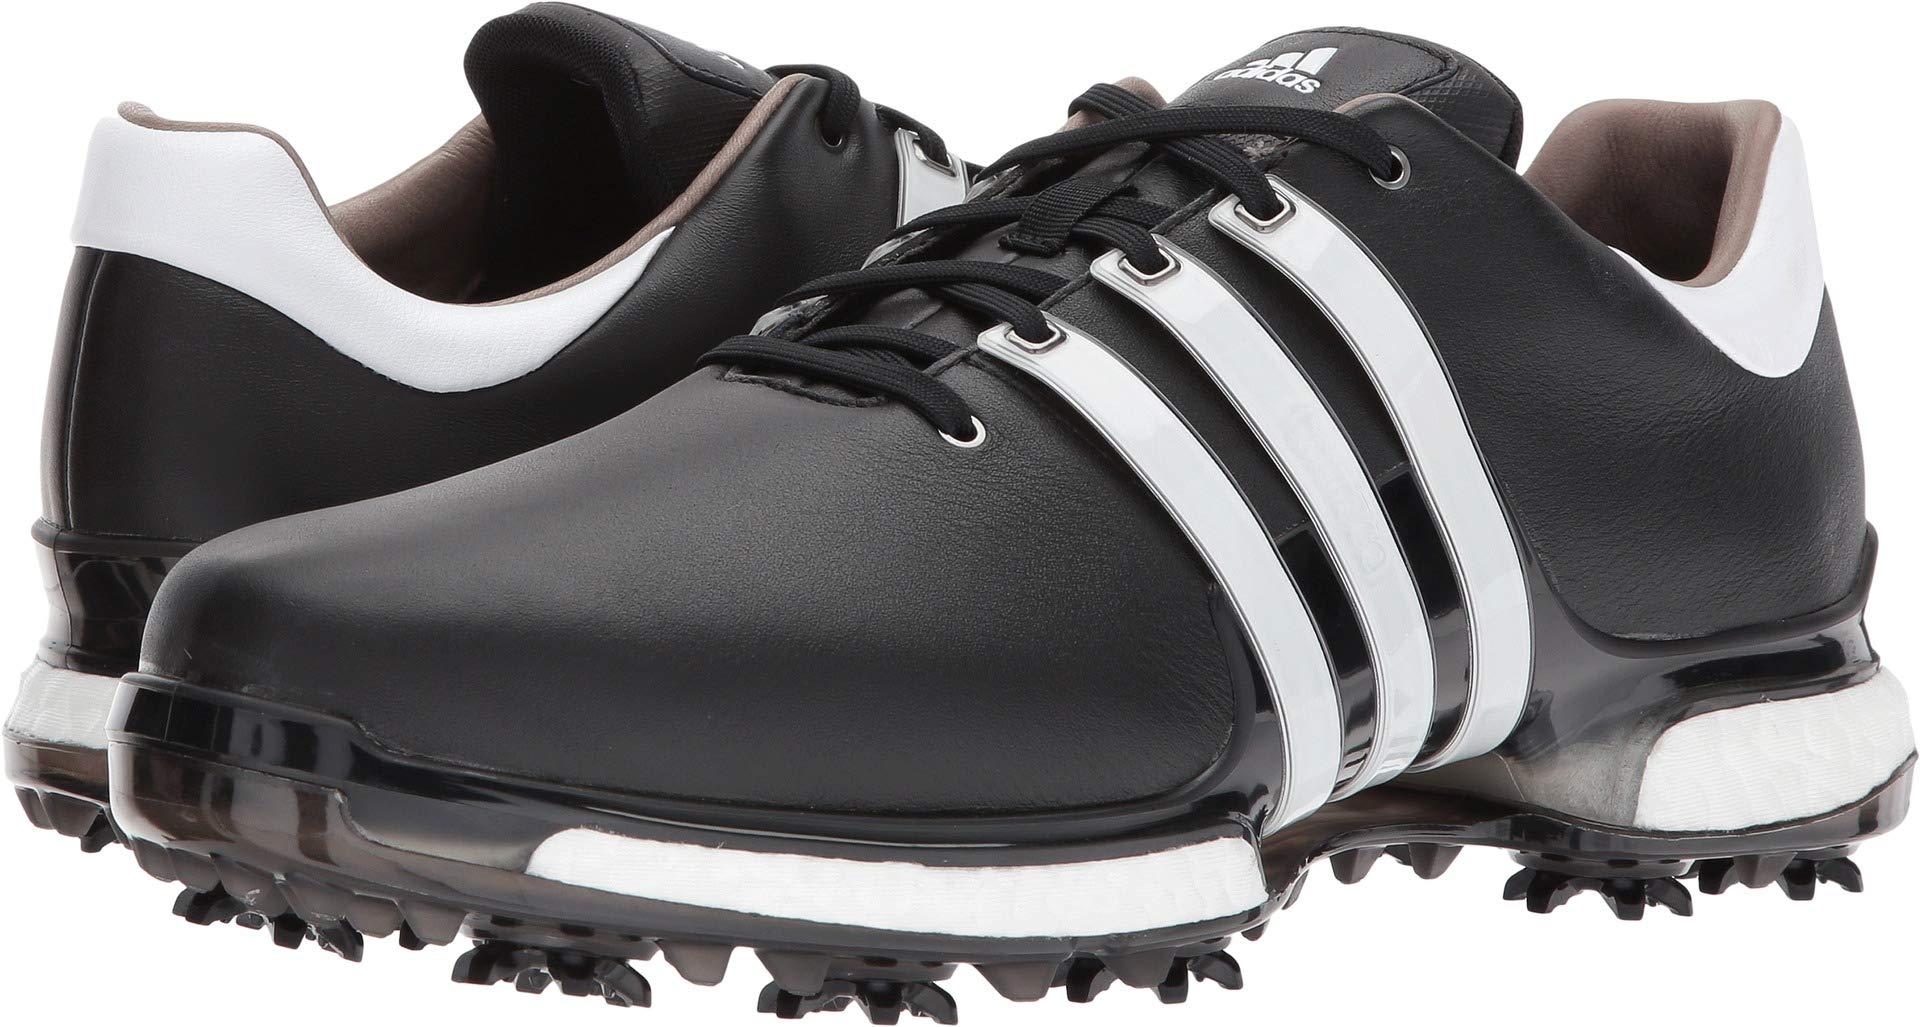 adidas Men's TOUR 360 2.0 Golf Shoe, Core Black/White, 7.5 M US